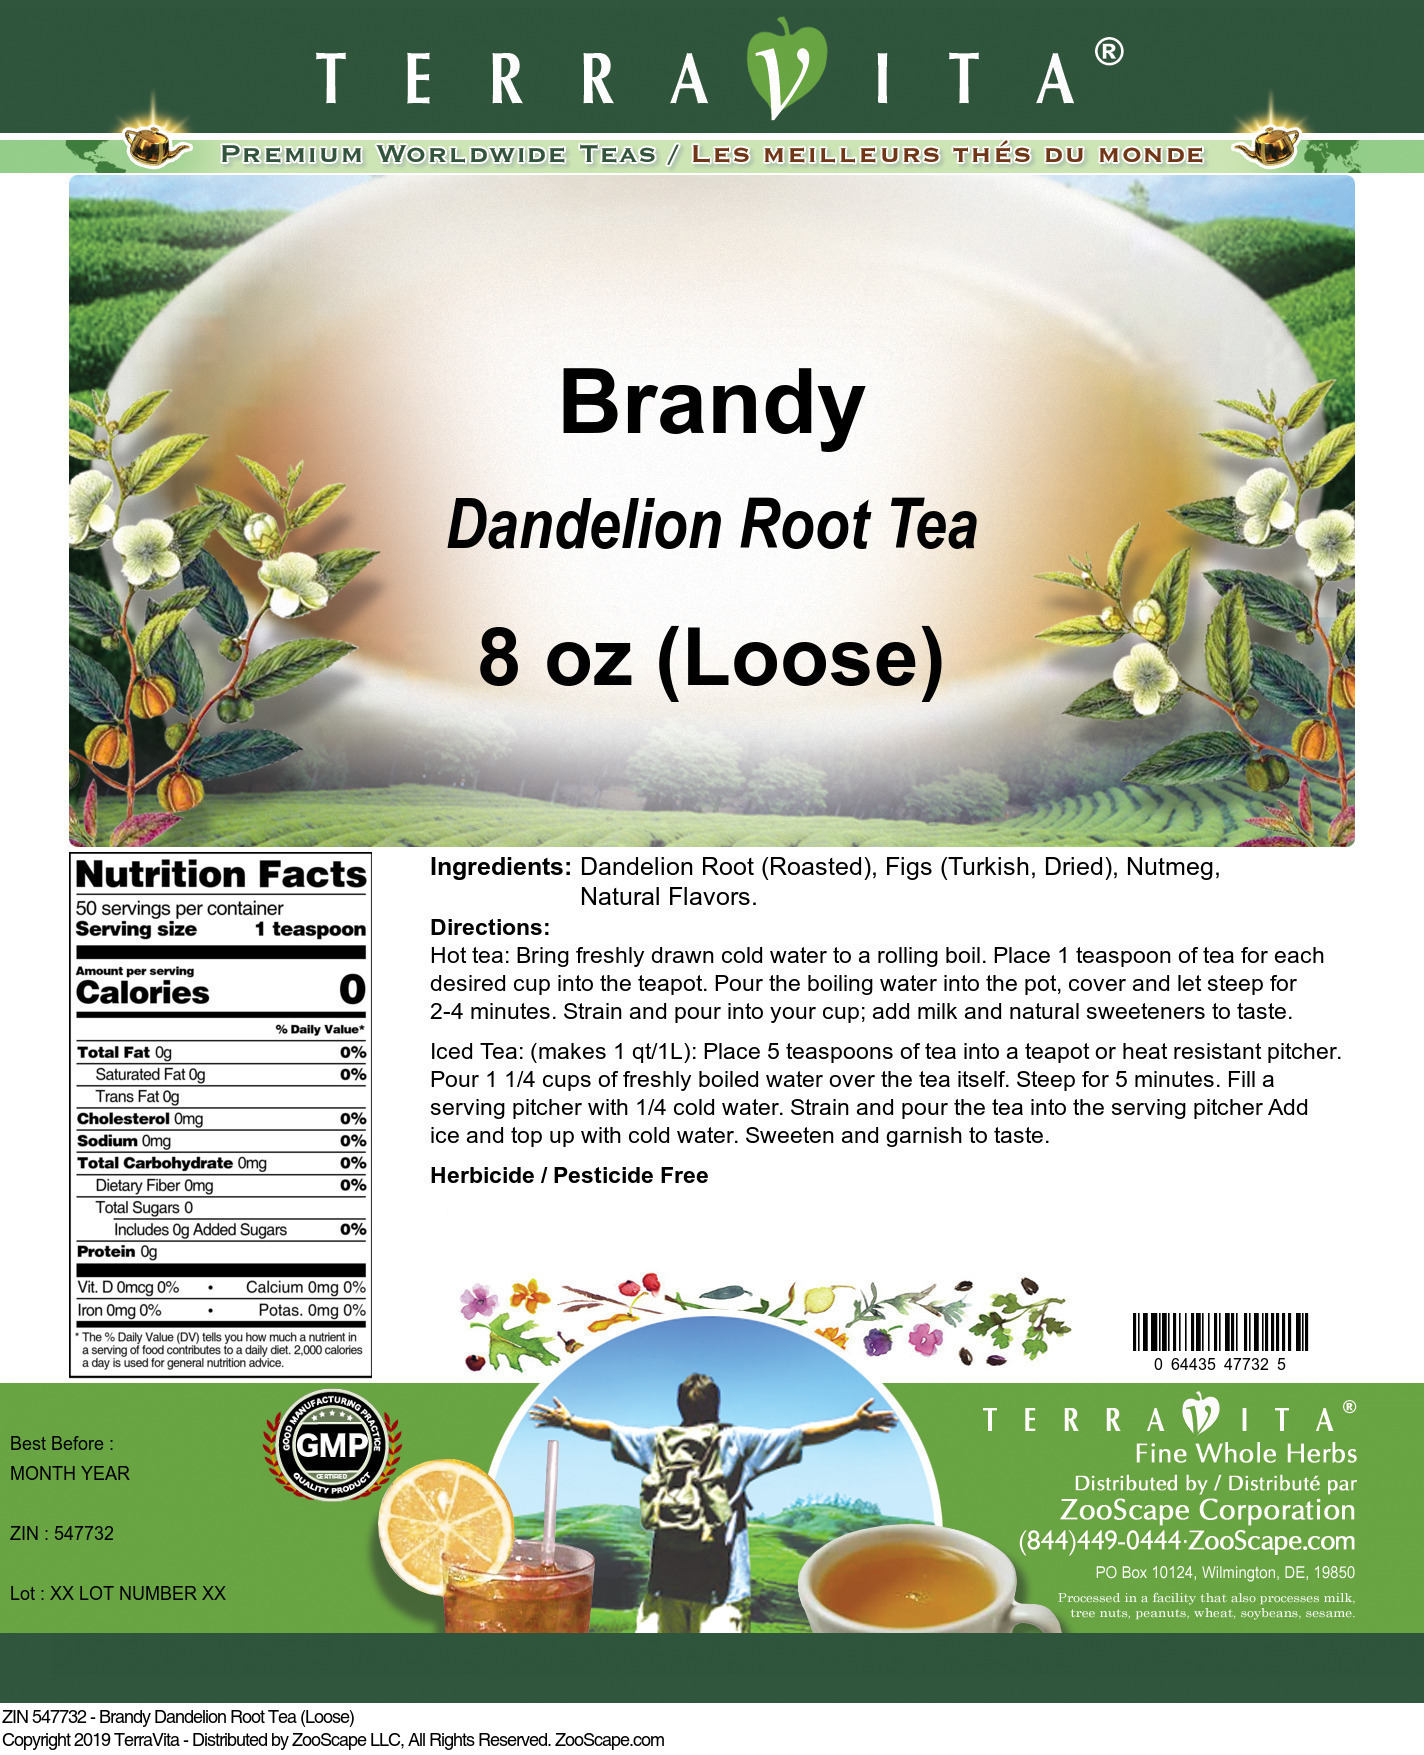 Brandy Dandelion Root Tea (Loose)